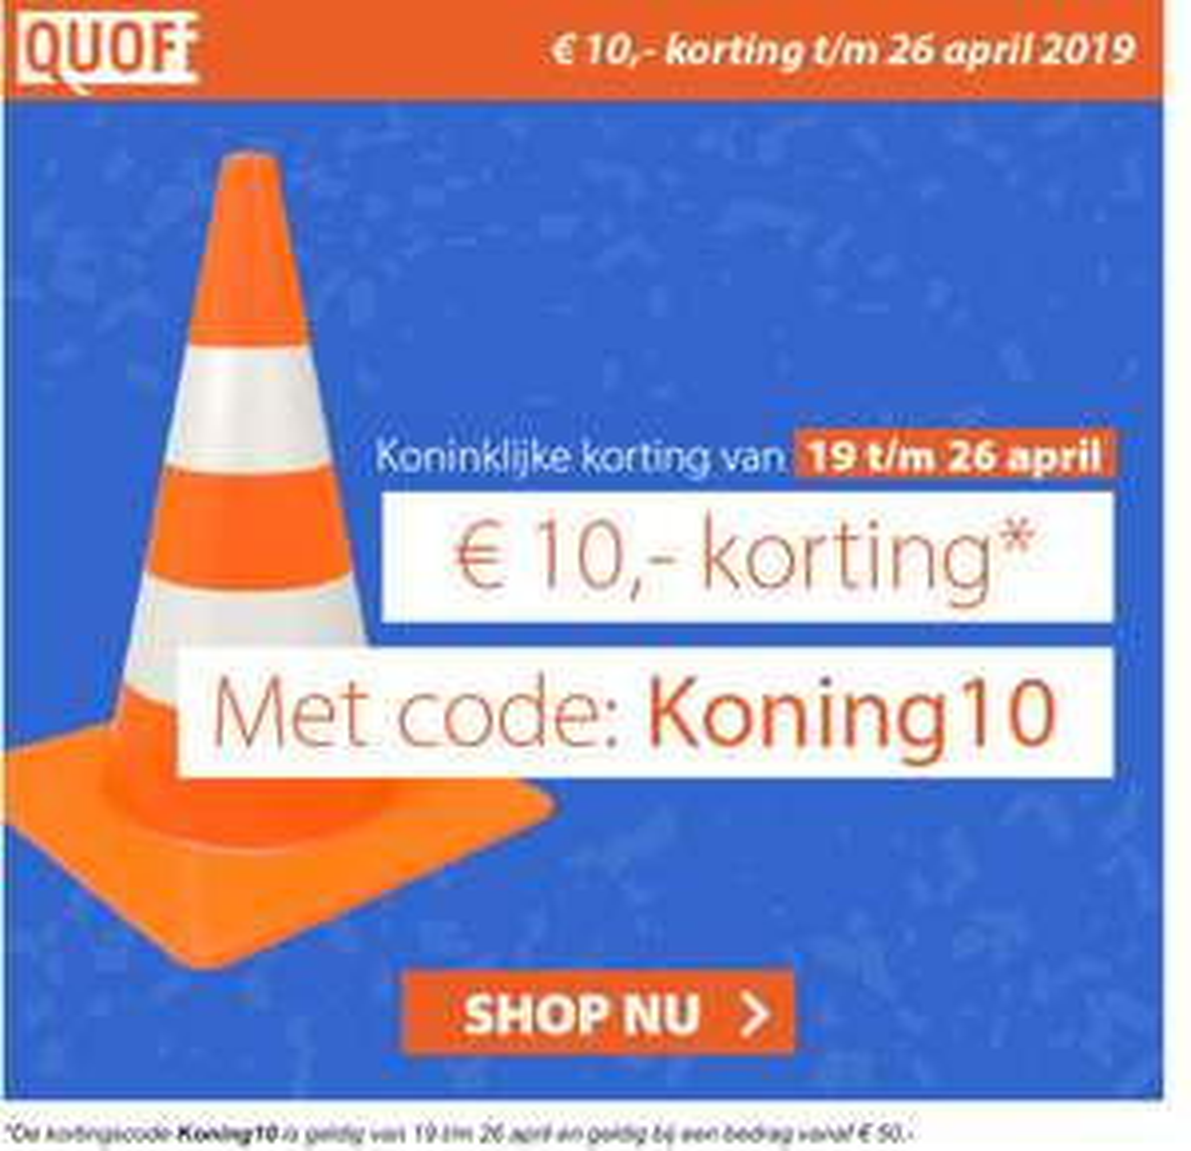 € 10,- korting bij bestelling vanaf € 50,00@Quofi